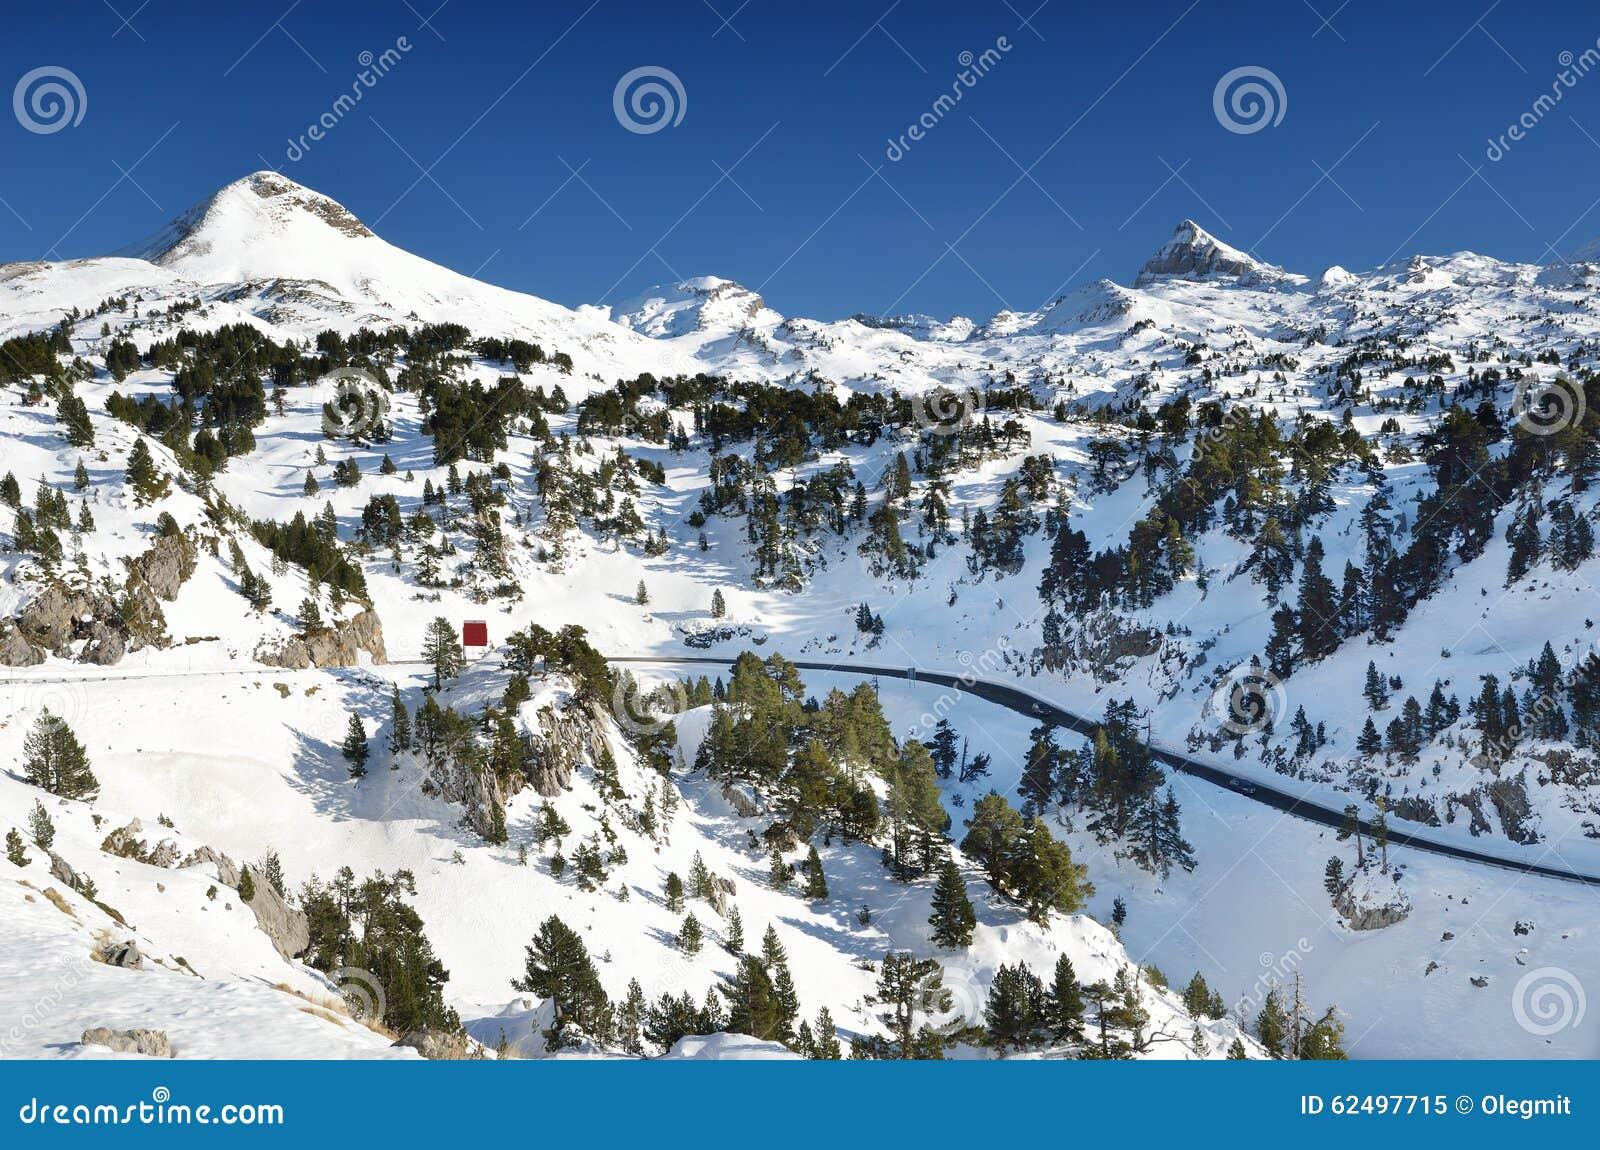 winter mountains near the ski resort pierre saint martin stock image